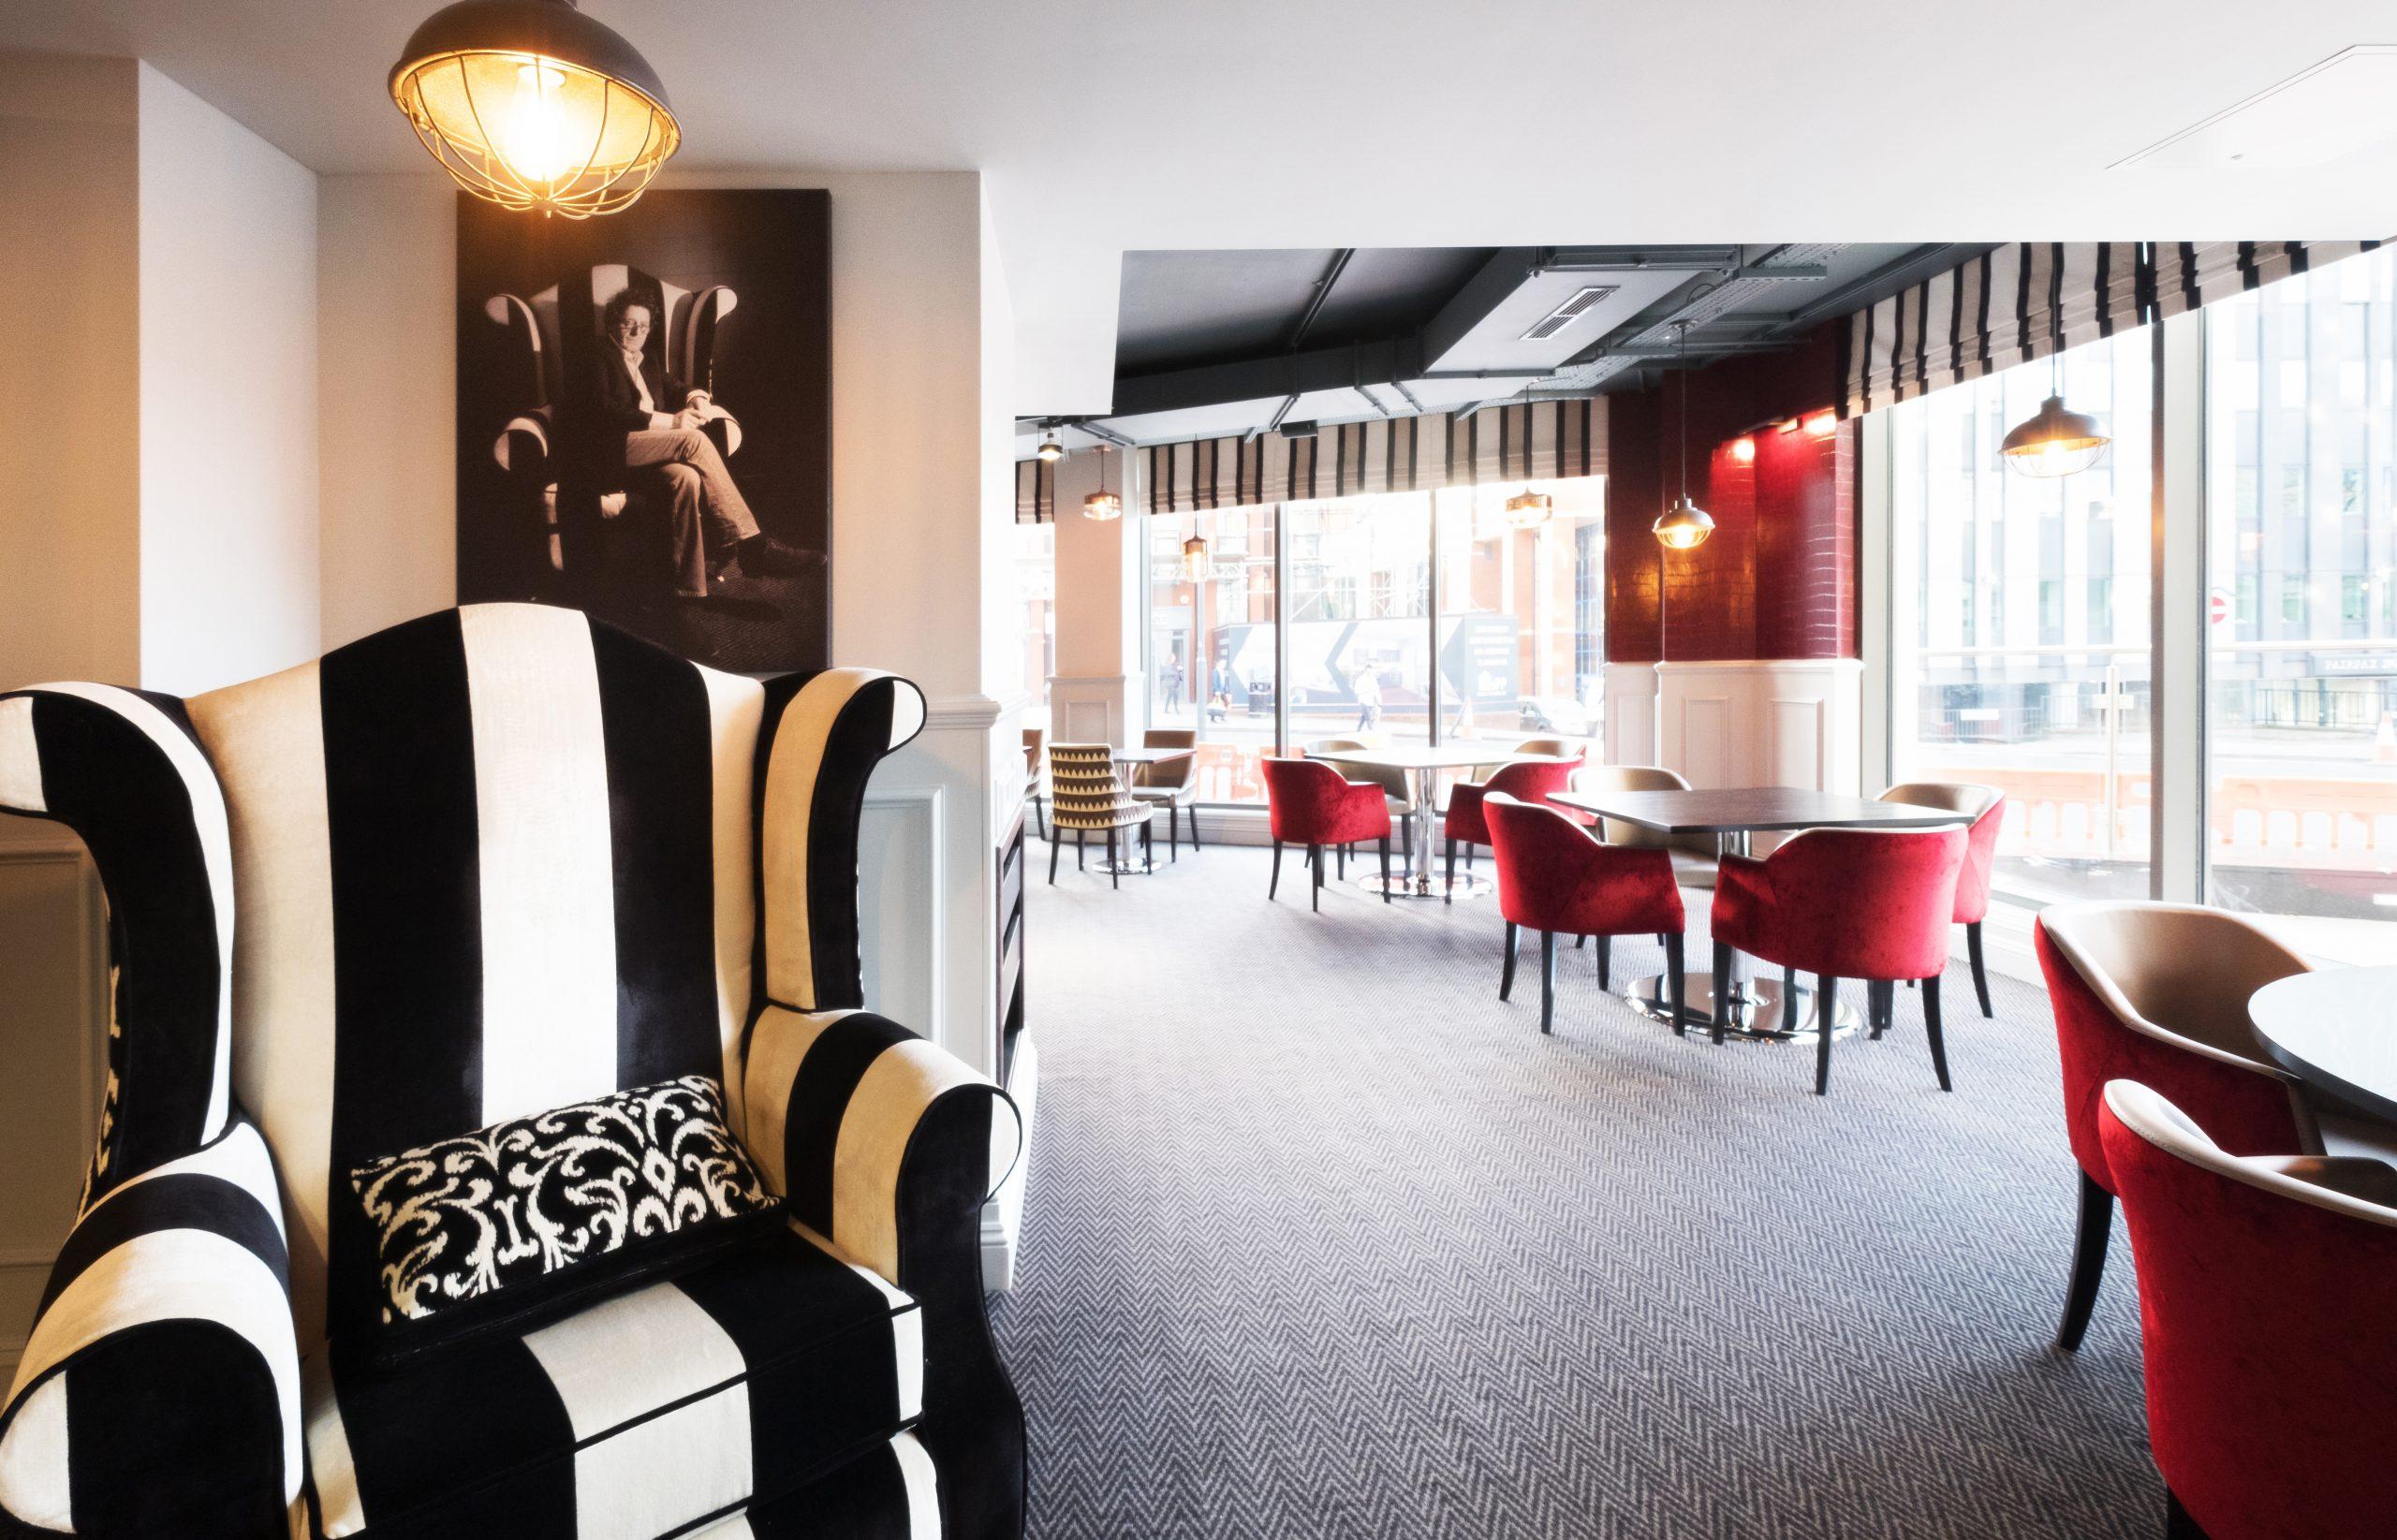 Ibis Styles interior - credit Evoke Pictures